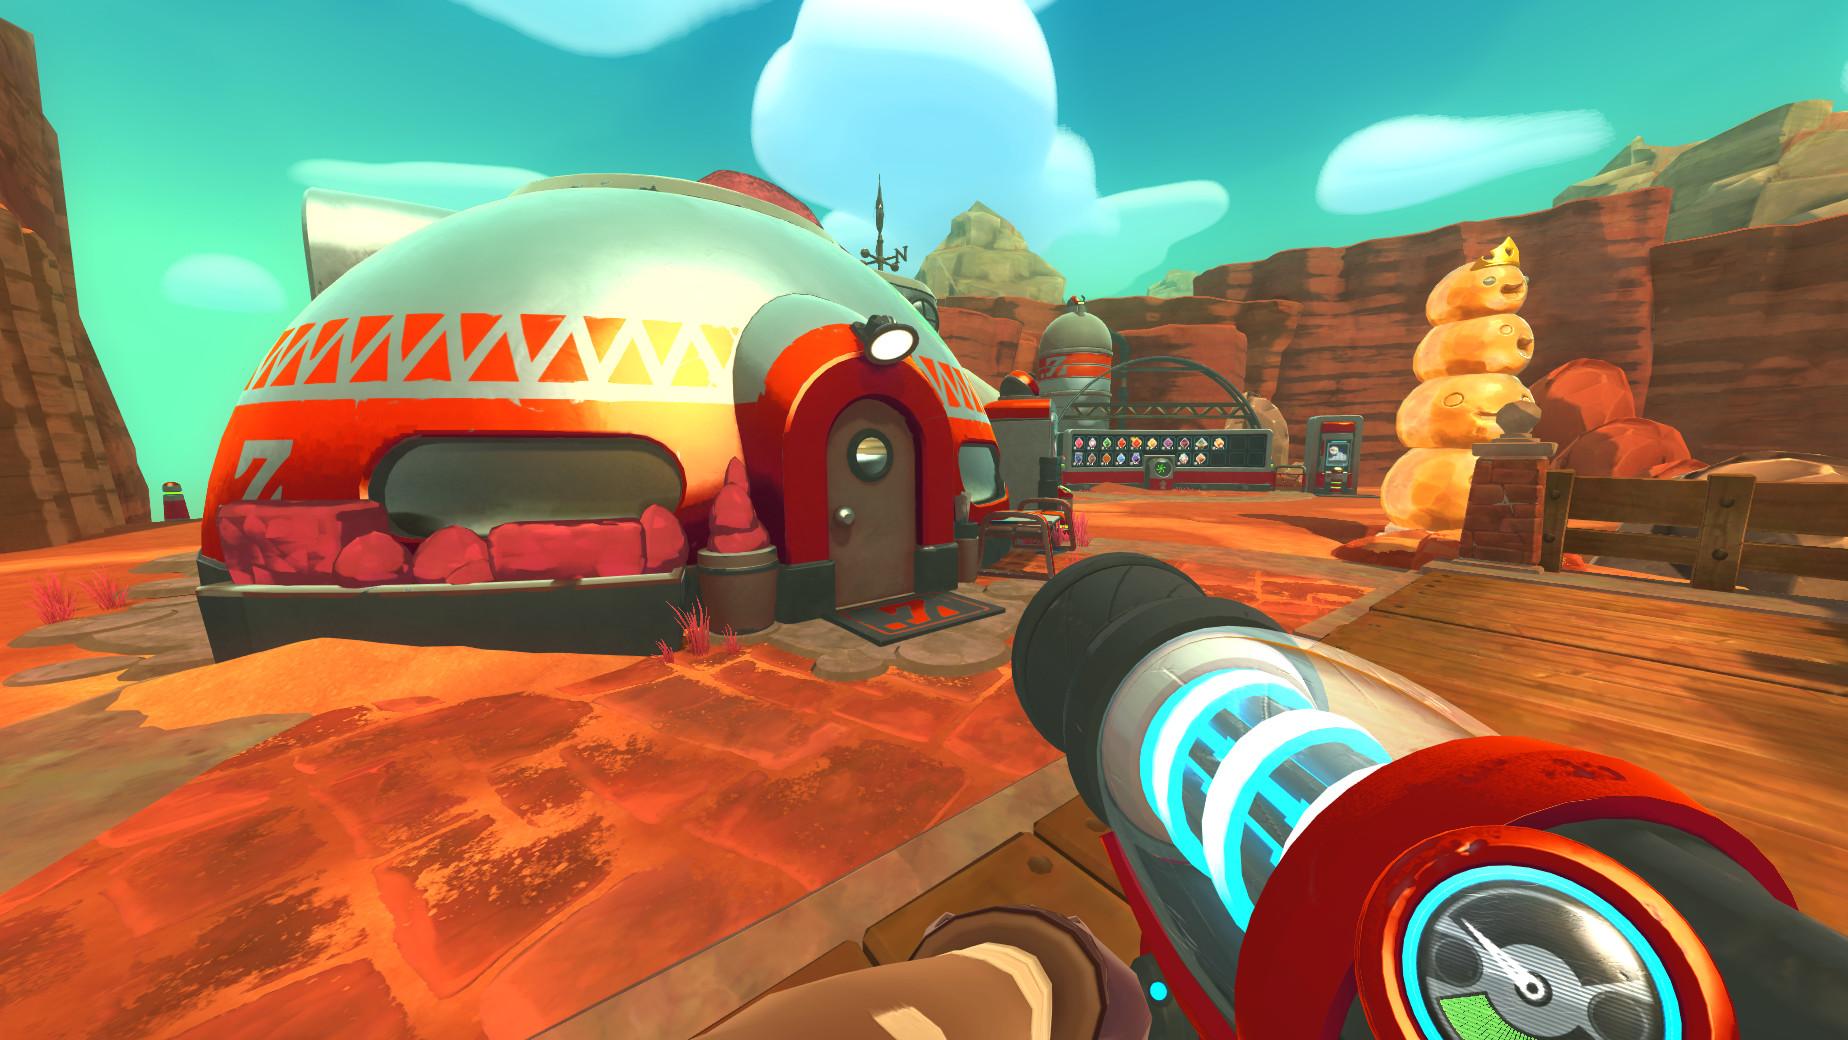 Slime Rancher: Galactic Bundle on Steam